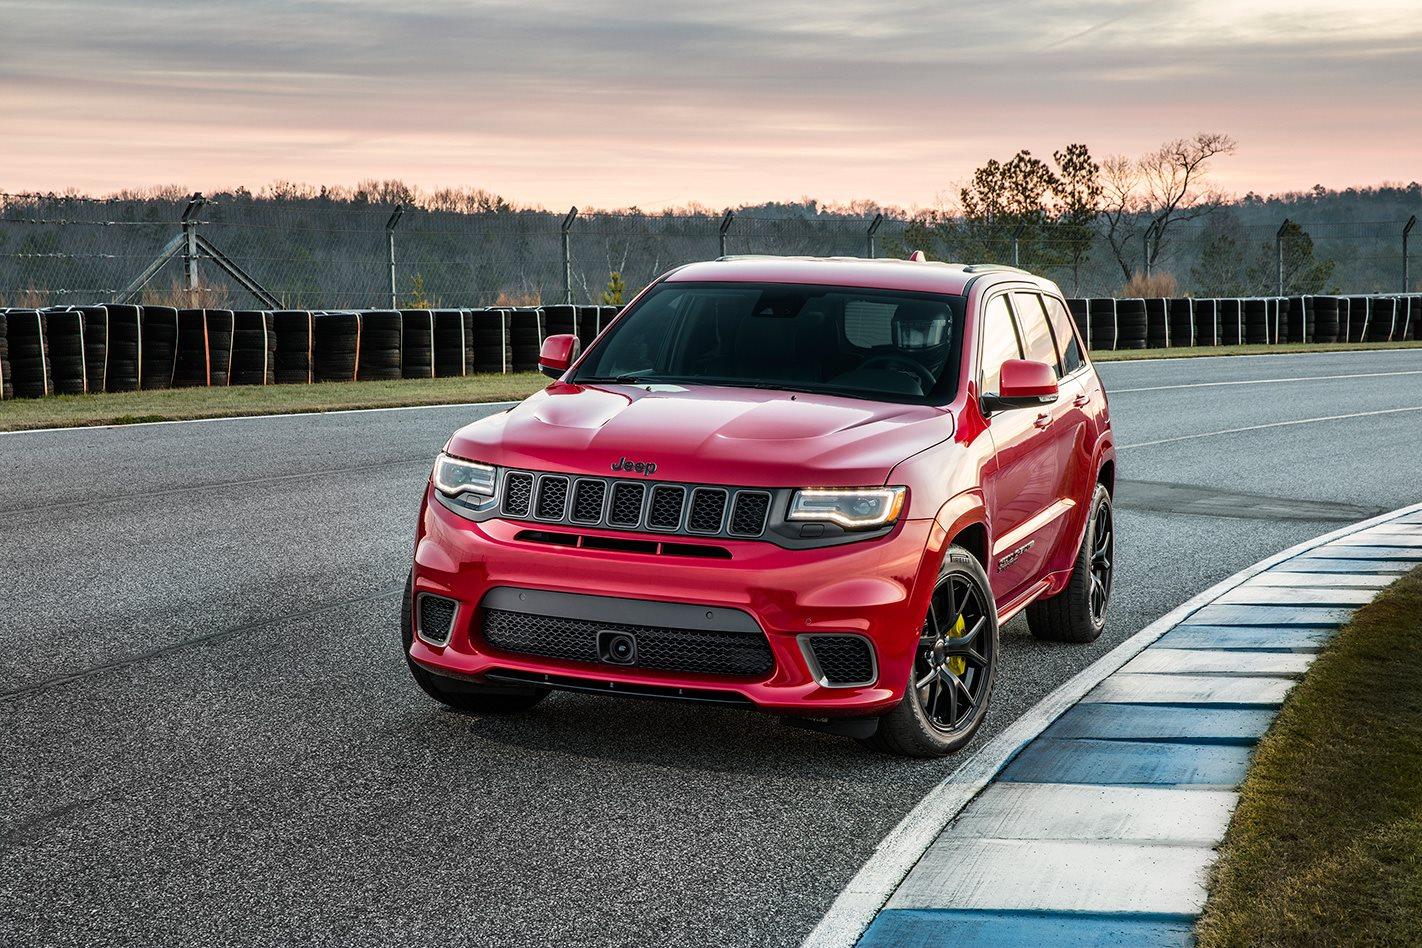 2018 Jeep Grand Cherokee Trackhawk front.jpg